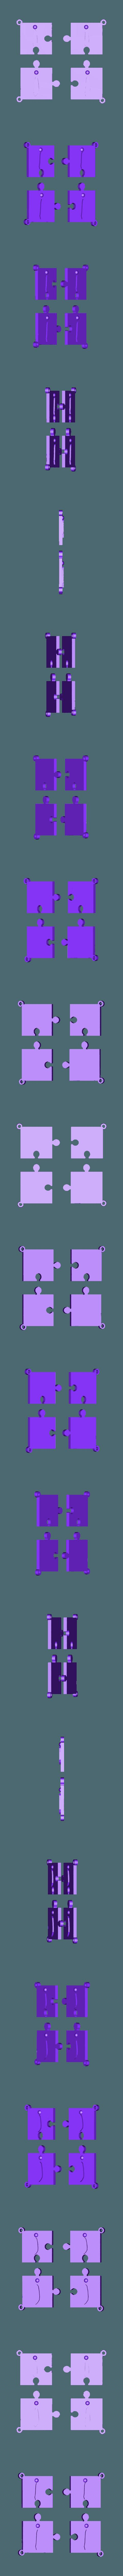 puzzle i.stl Download STL file puzzle key ring • 3D printing design, catf3d